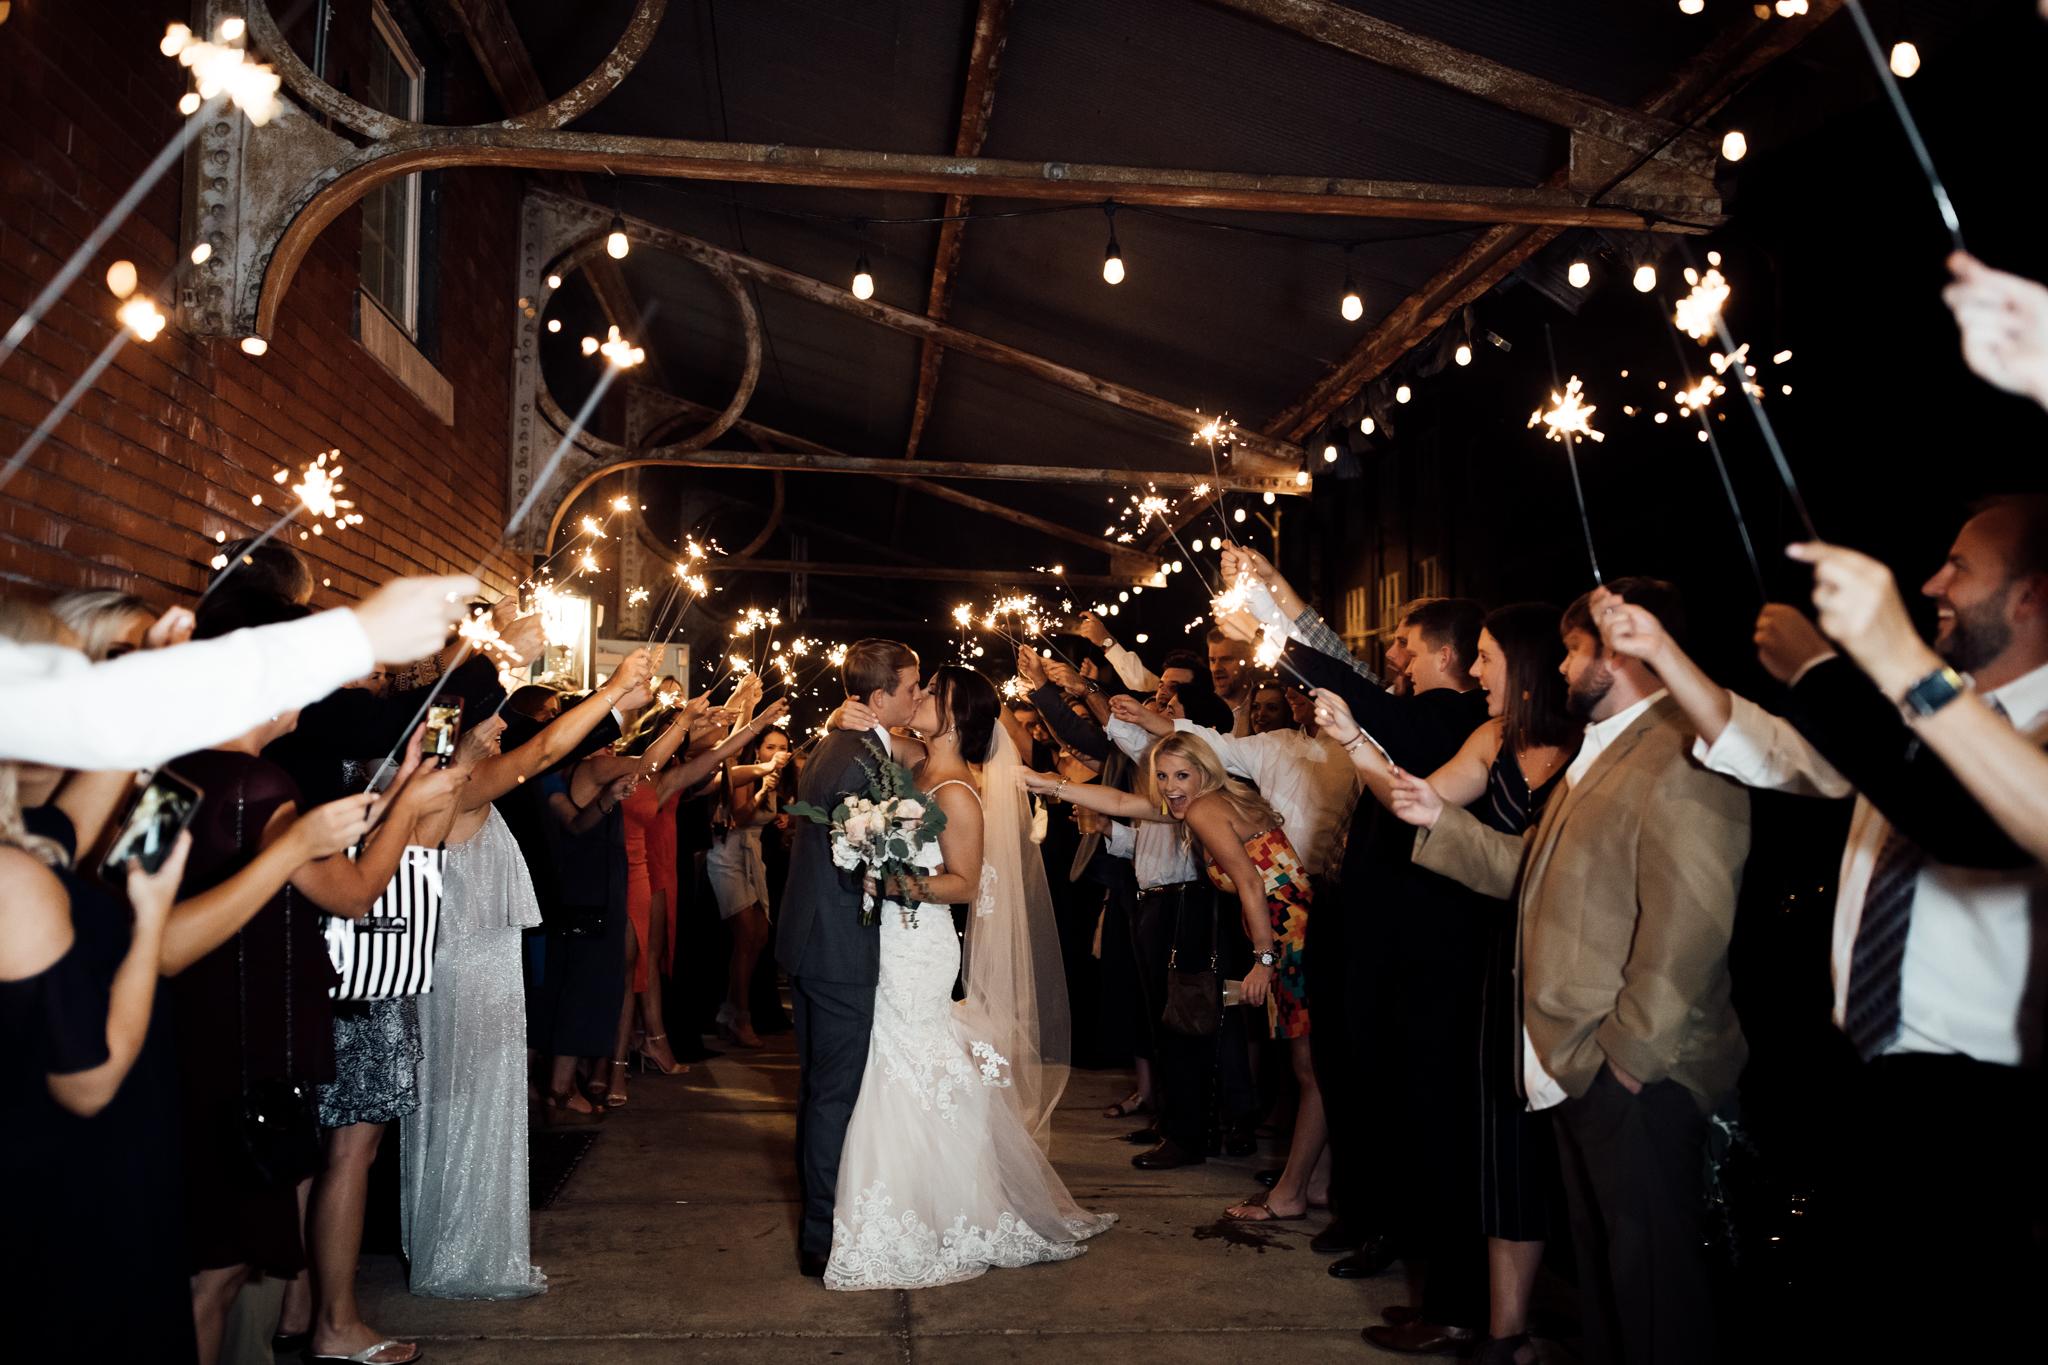 409smain-downtown-memphis-wedding-venue-thewarmtharoundyou (226 of 243).jpg